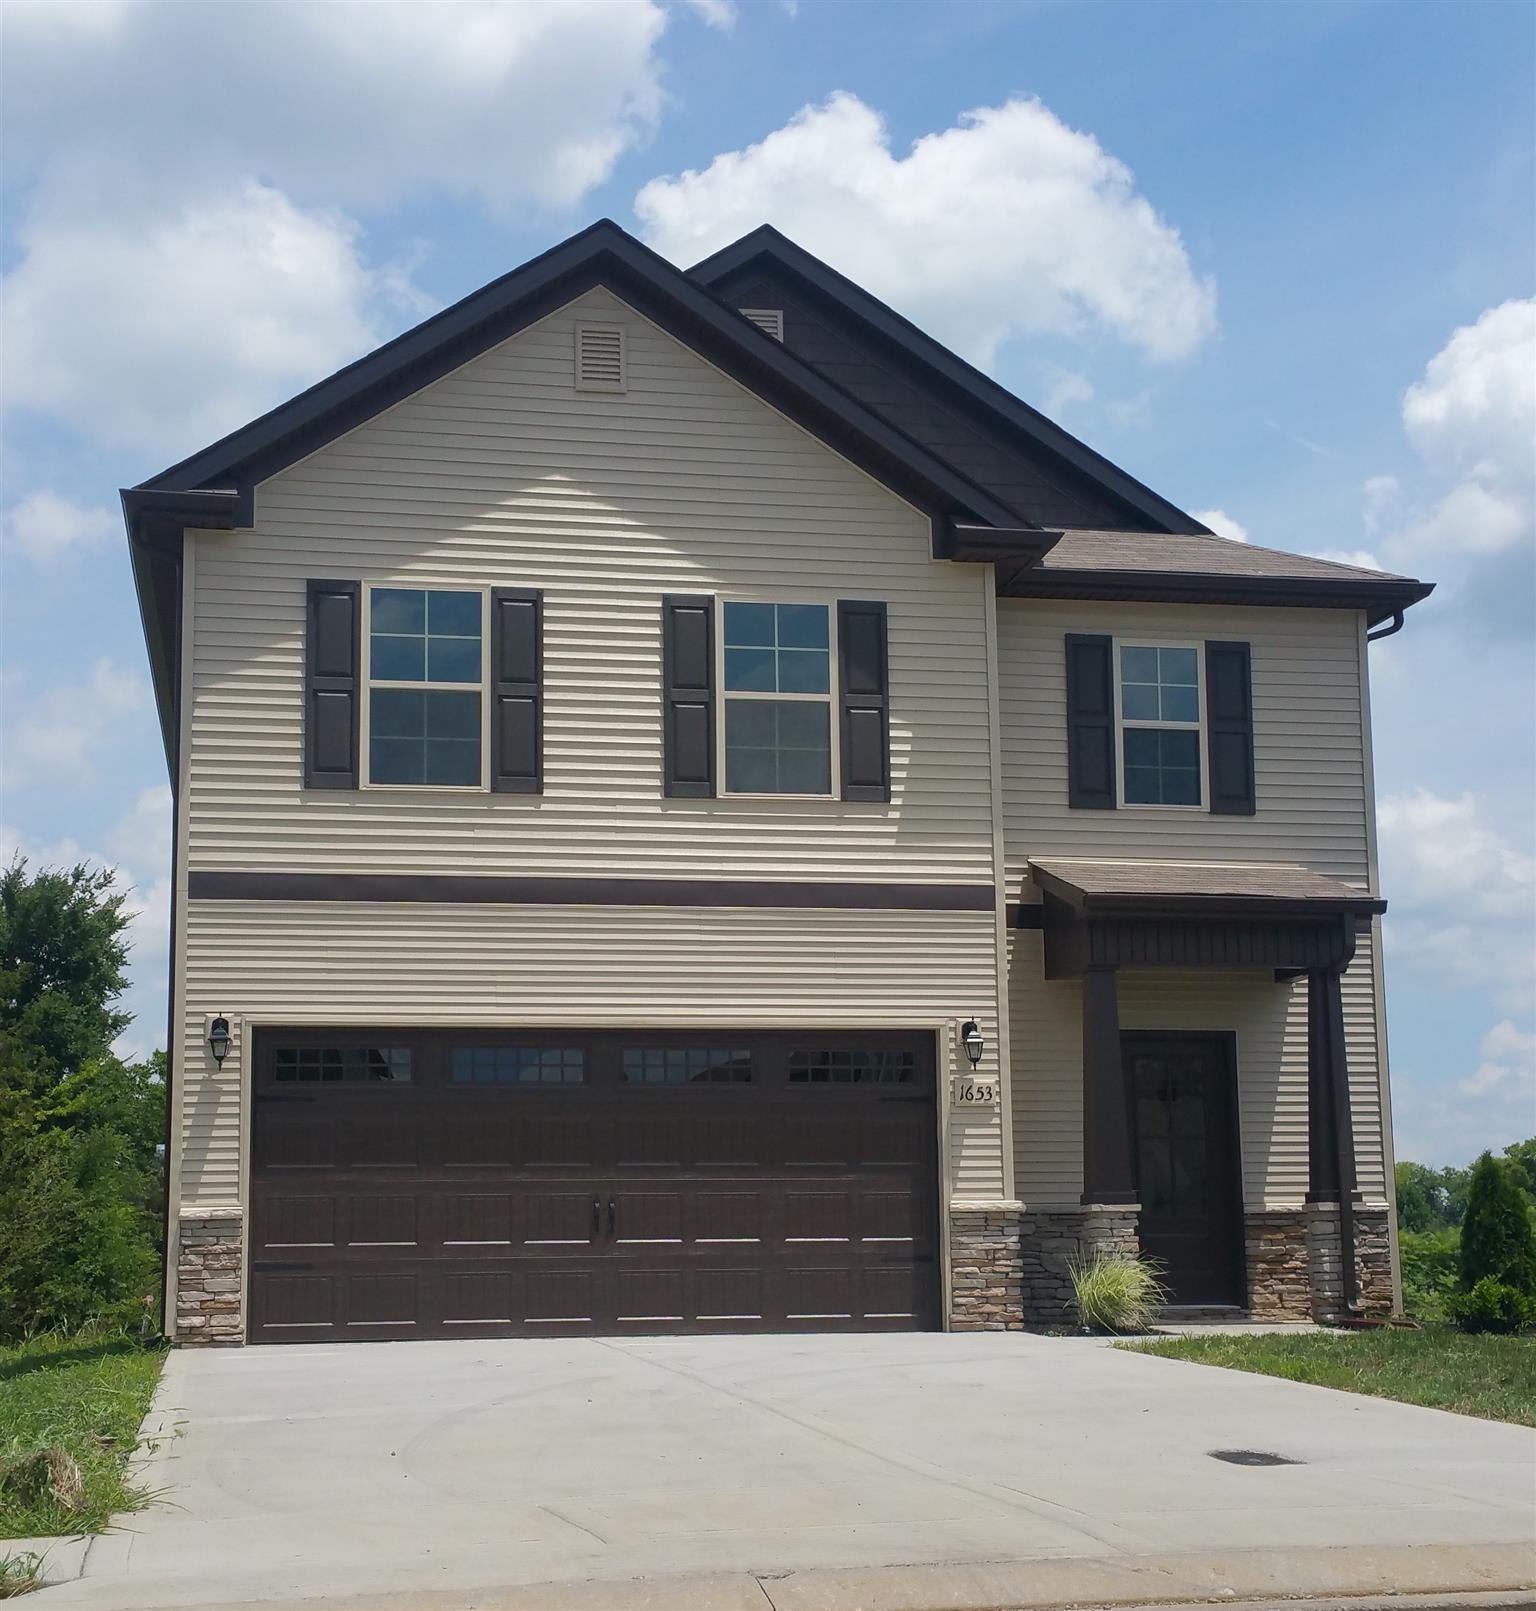 Photo of 1630 Warmingfield Dr - Lot 67  Murfreesboro  TN